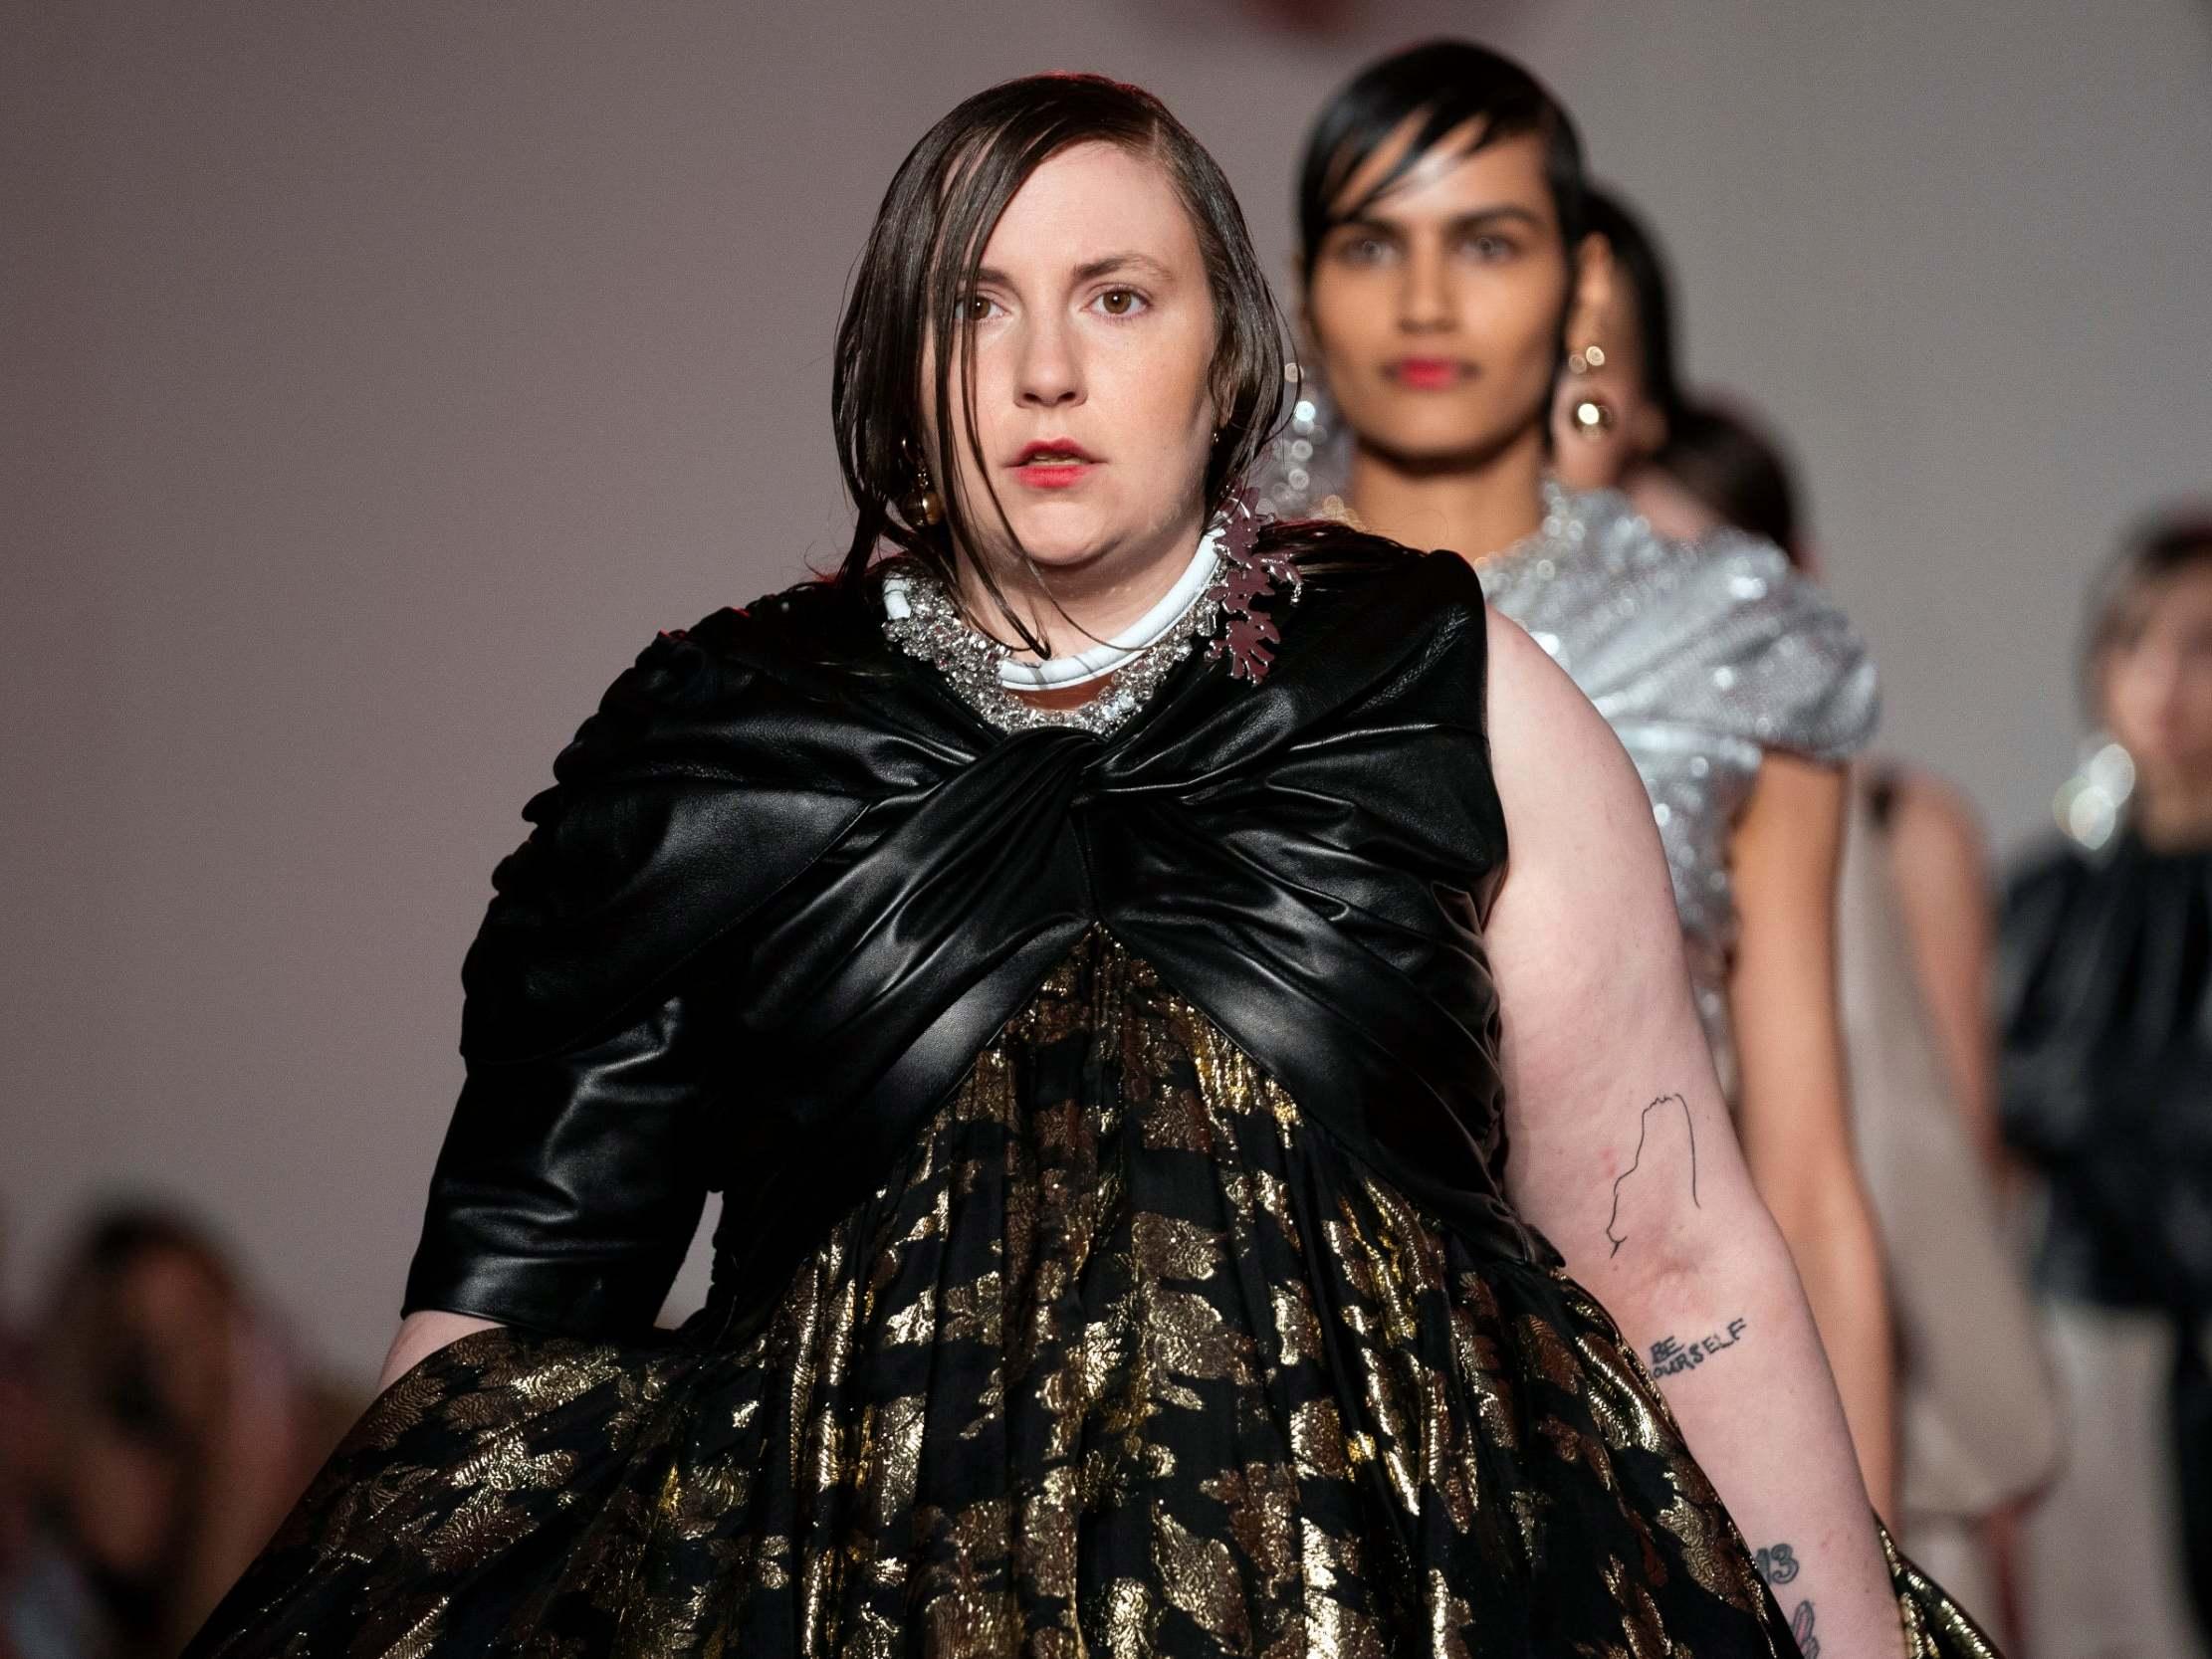 Lena Dunham has 'dream come true' making catwalk debut at London Fashion Walk